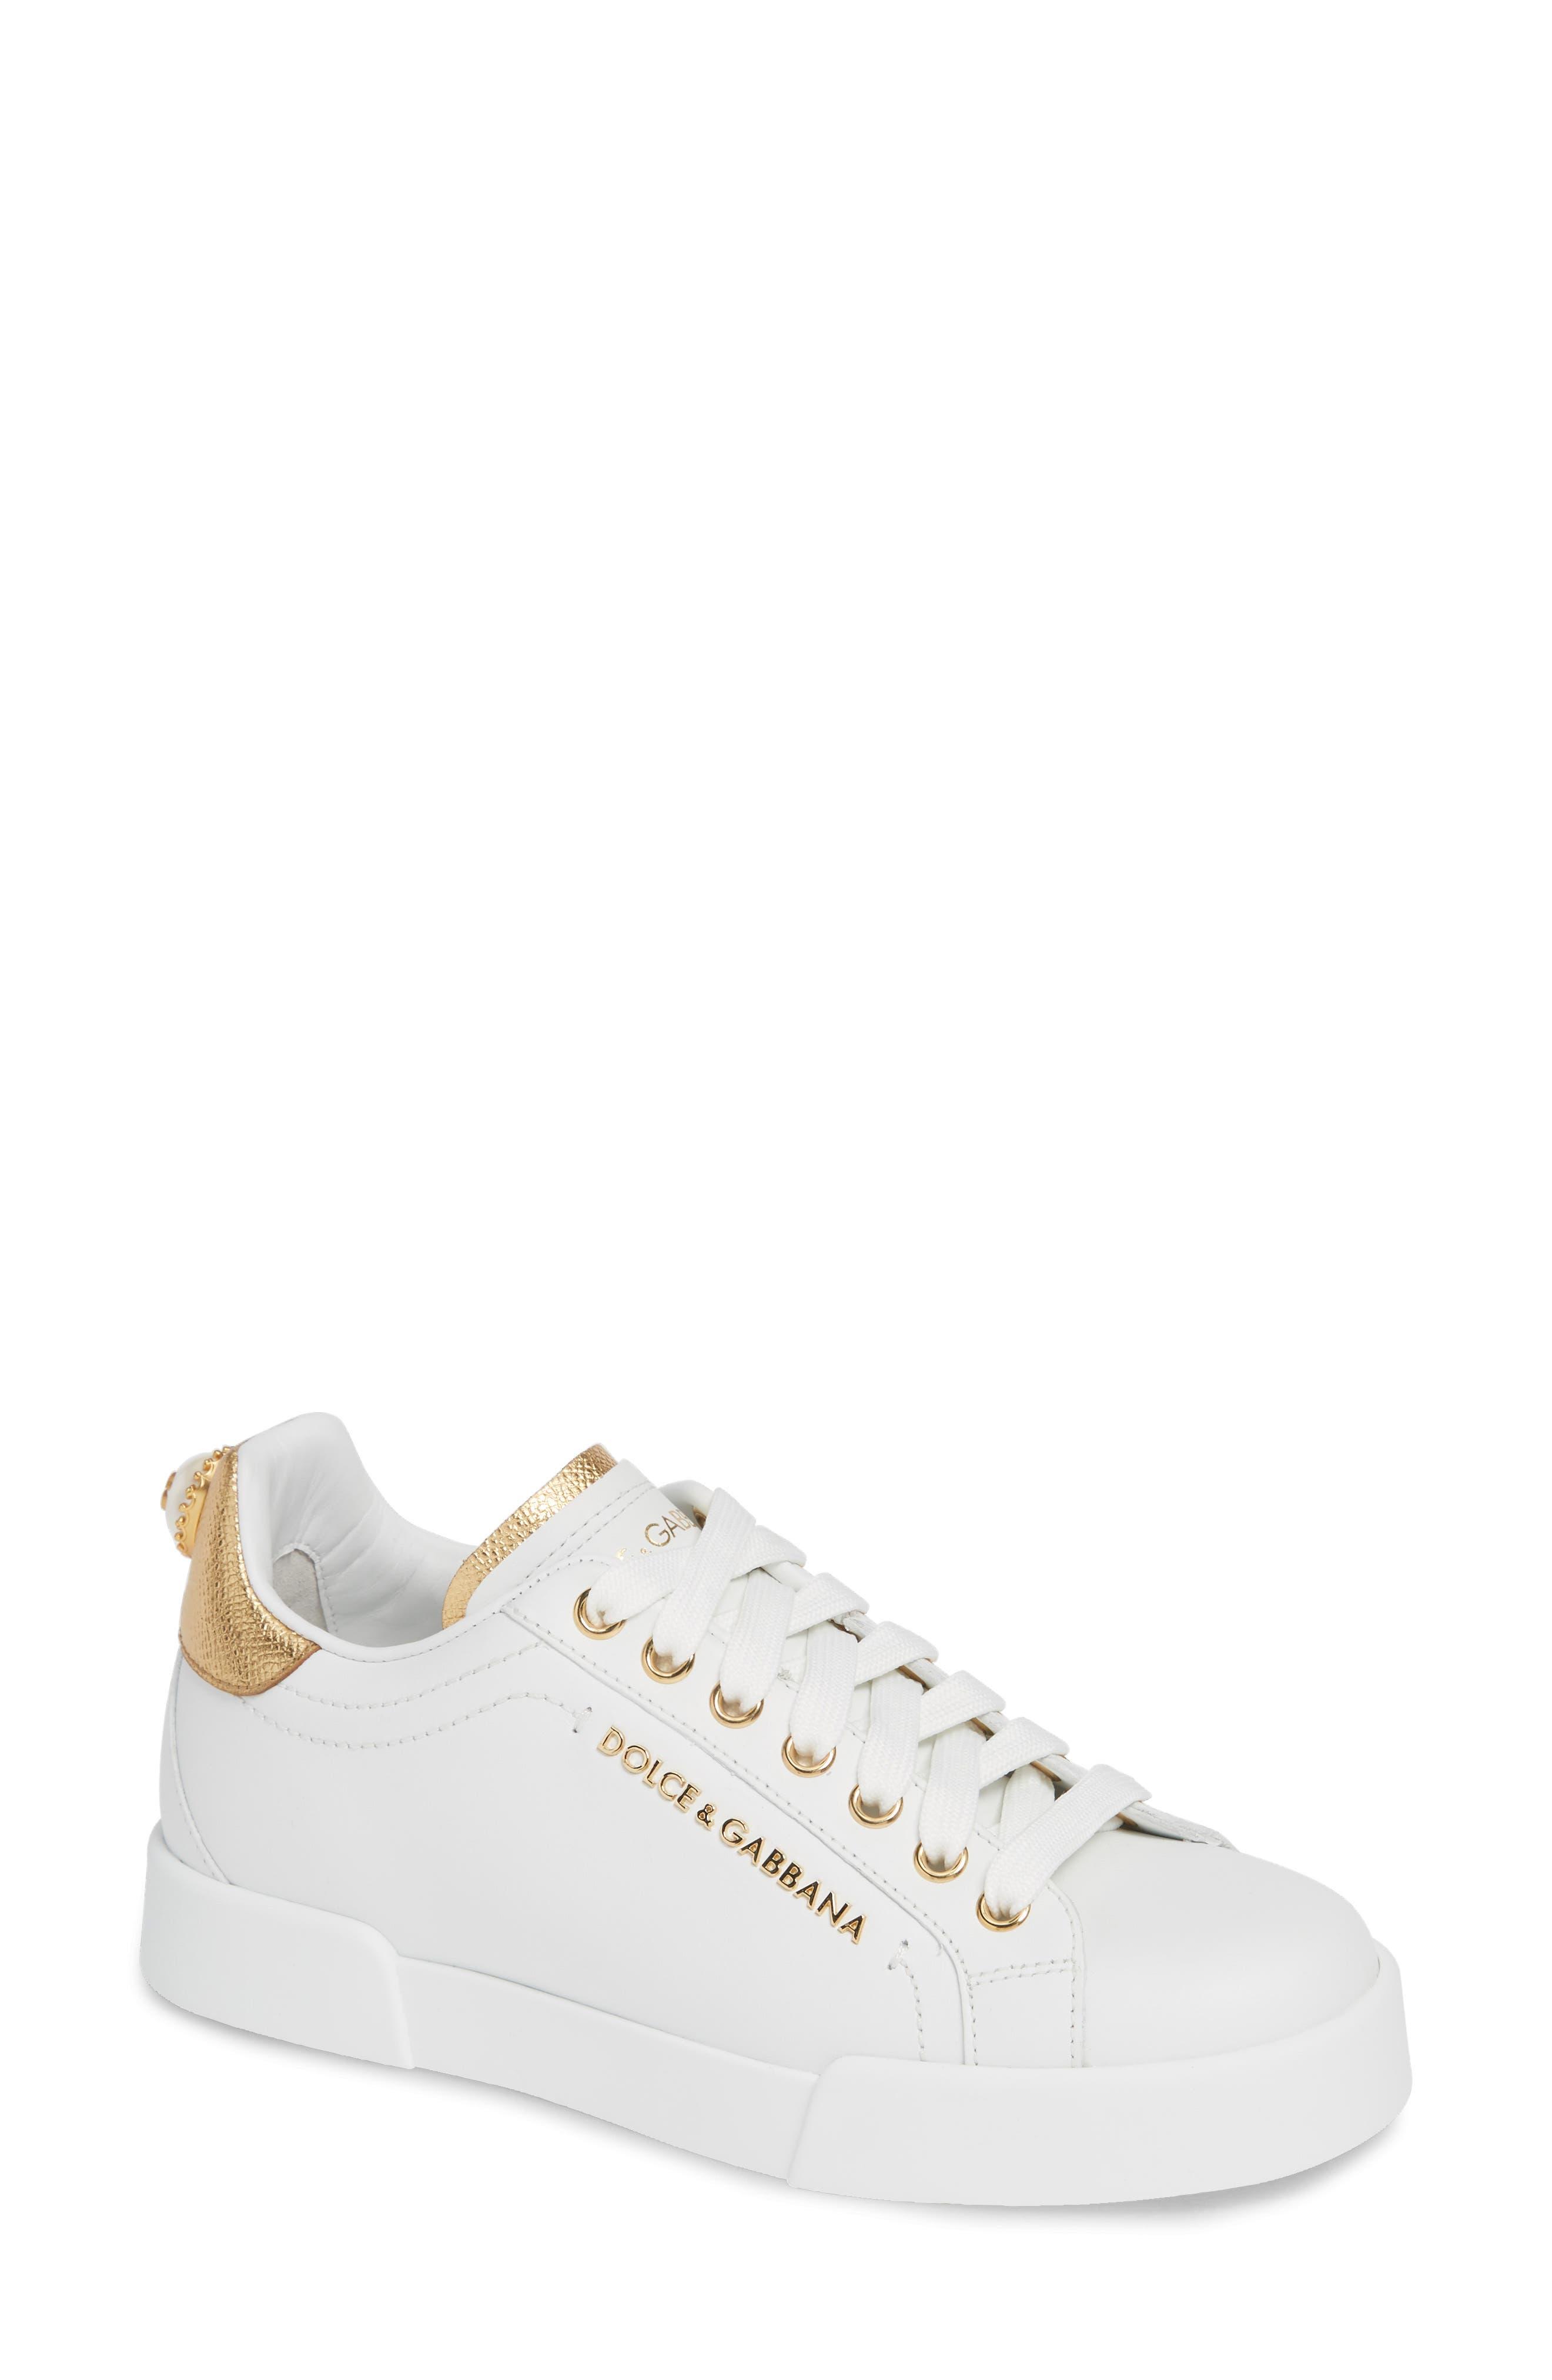 DOLCE&GABBANA, Portofino Embellished Sneaker, Main thumbnail 1, color, WHITE/ GOLD